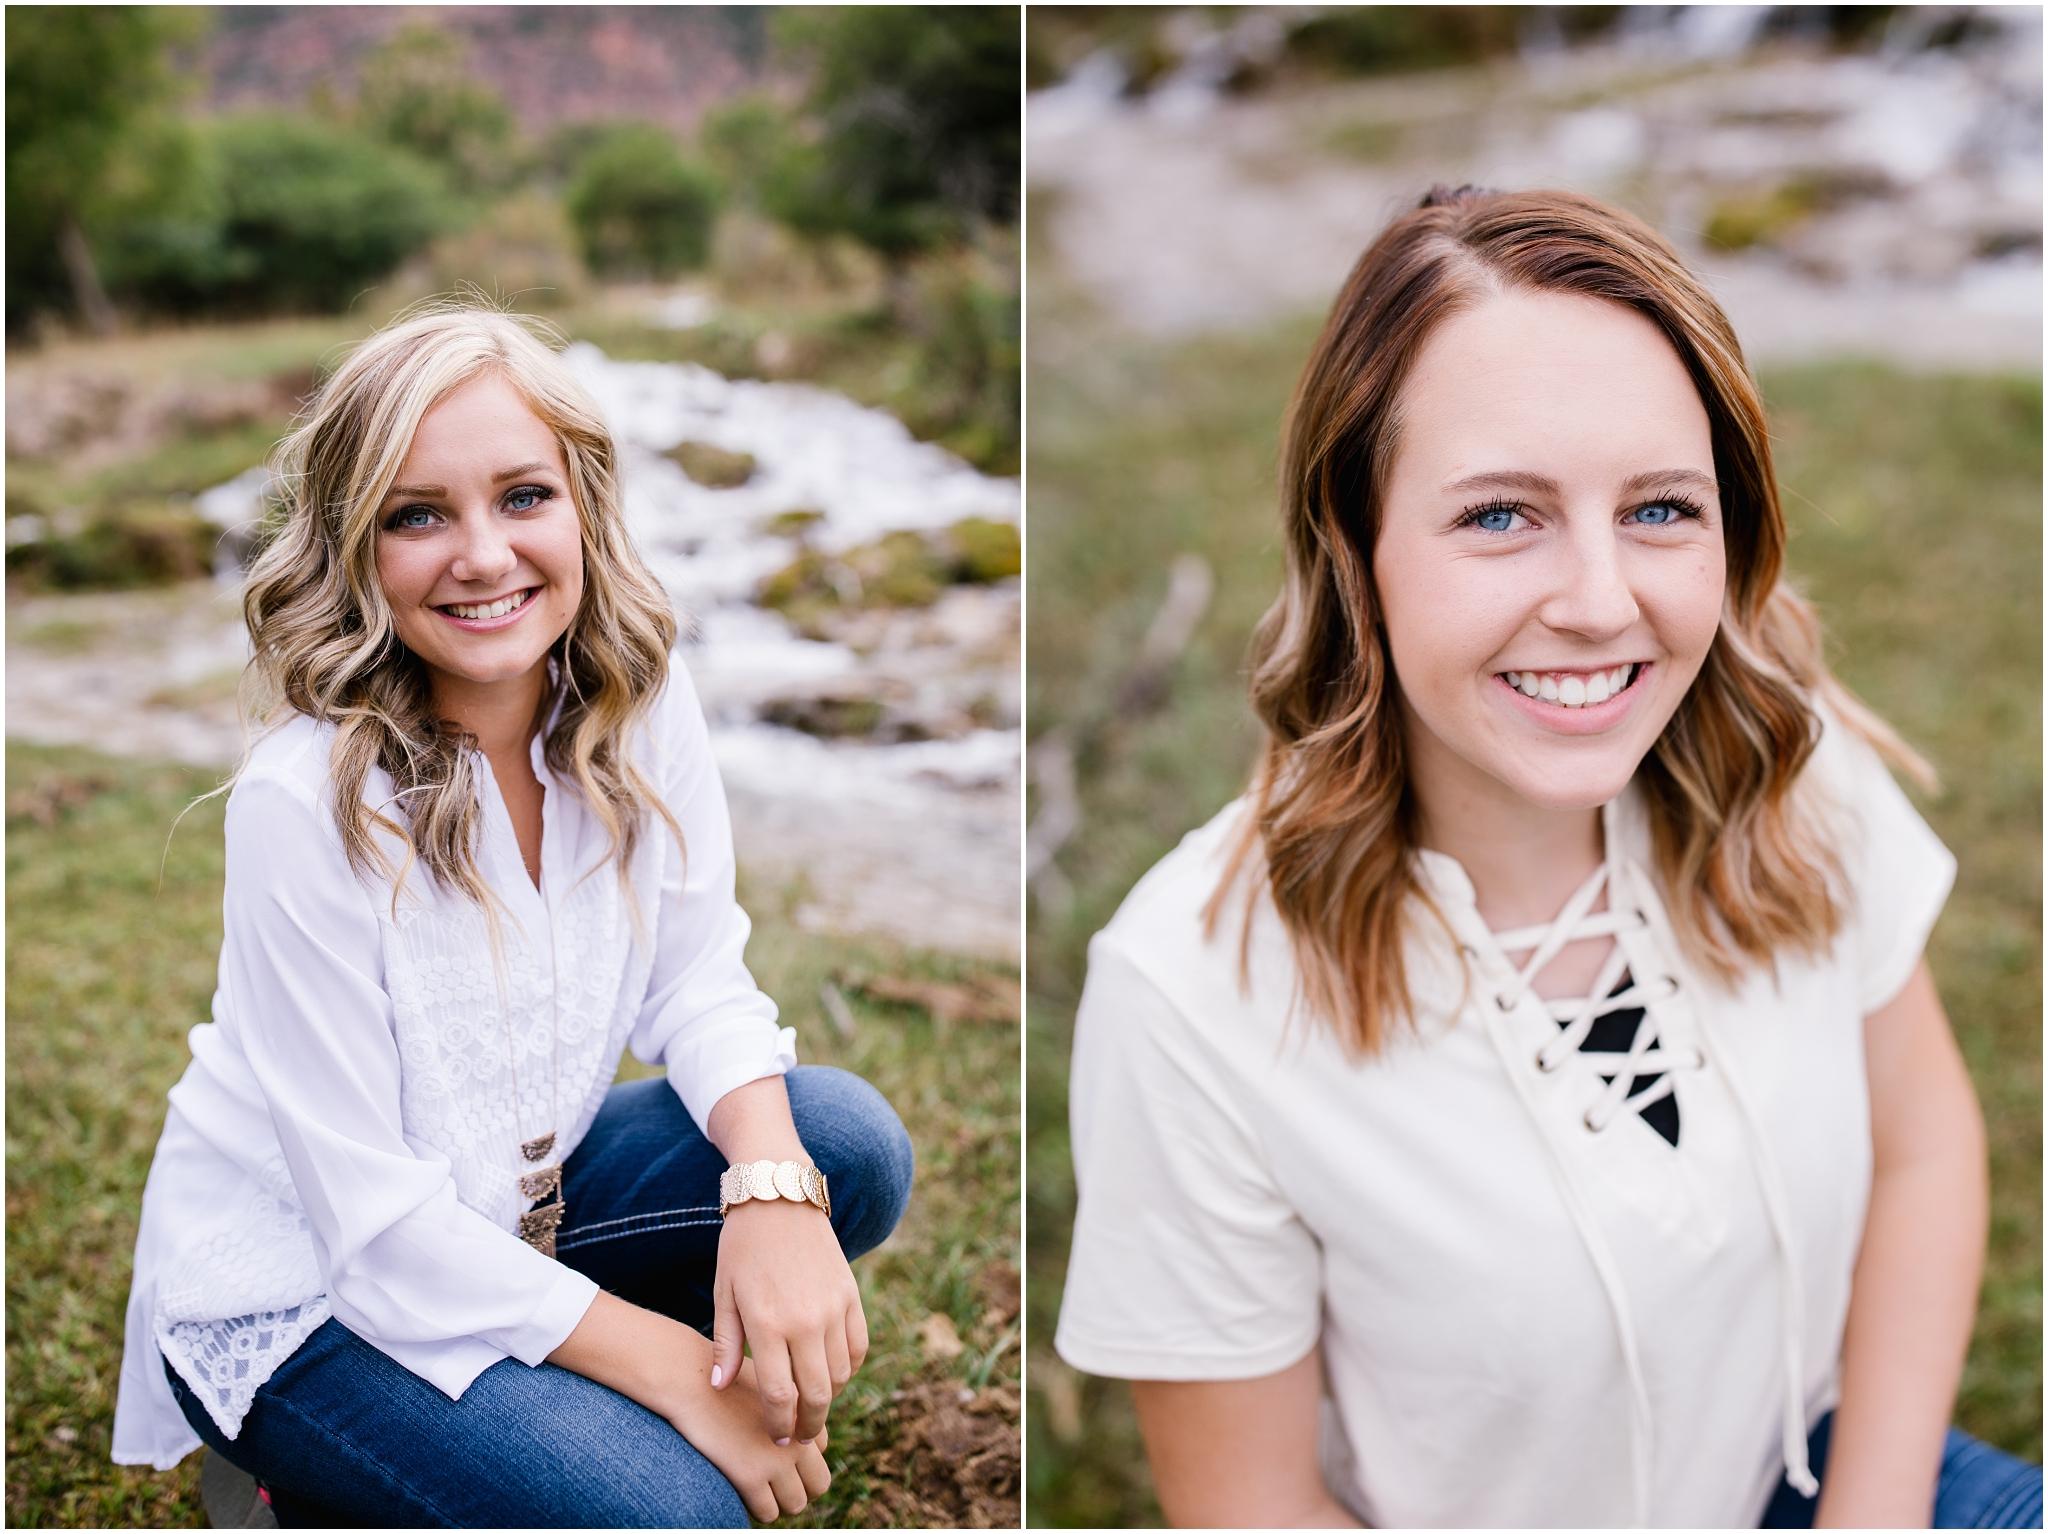 GVHSDRILL-77_Lizzie-B-Imagery-Utah-Family-Photographer-Central-Utah-Park-City-Salt-Lake-City-Drill-Team-Photography-Dance.jpg